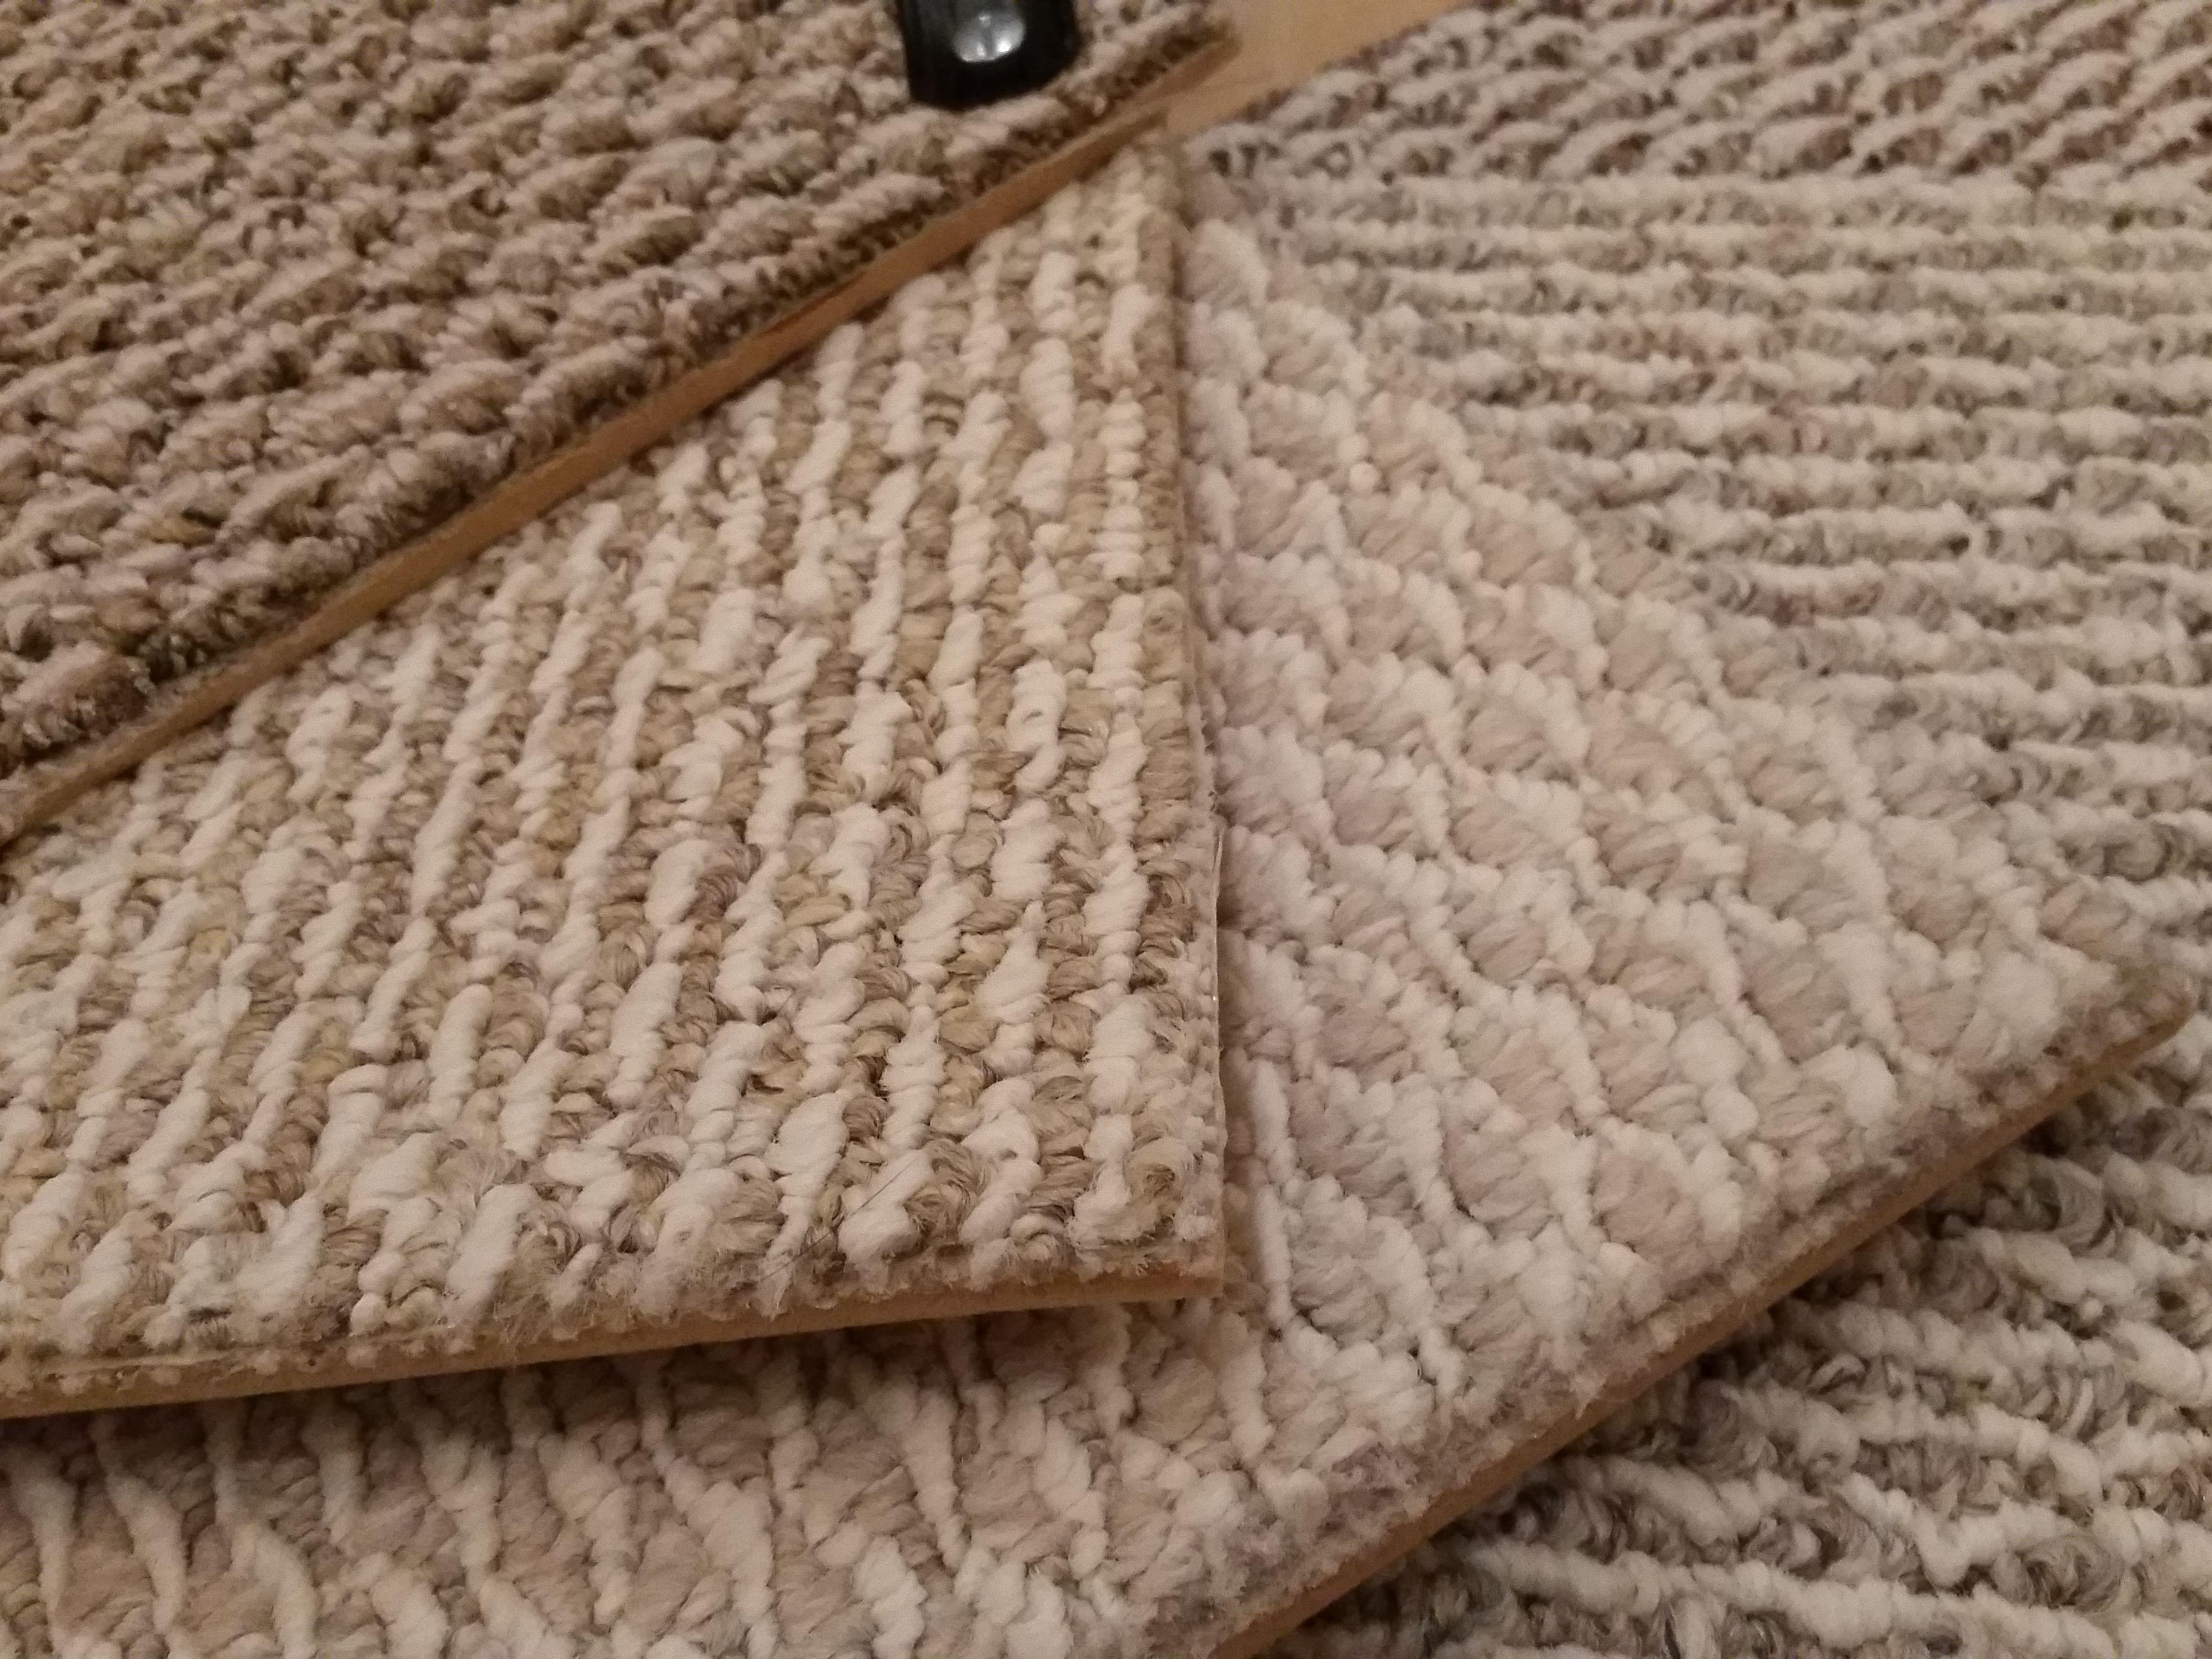 Kanga: Carpet Featuring Attached Foam Pad